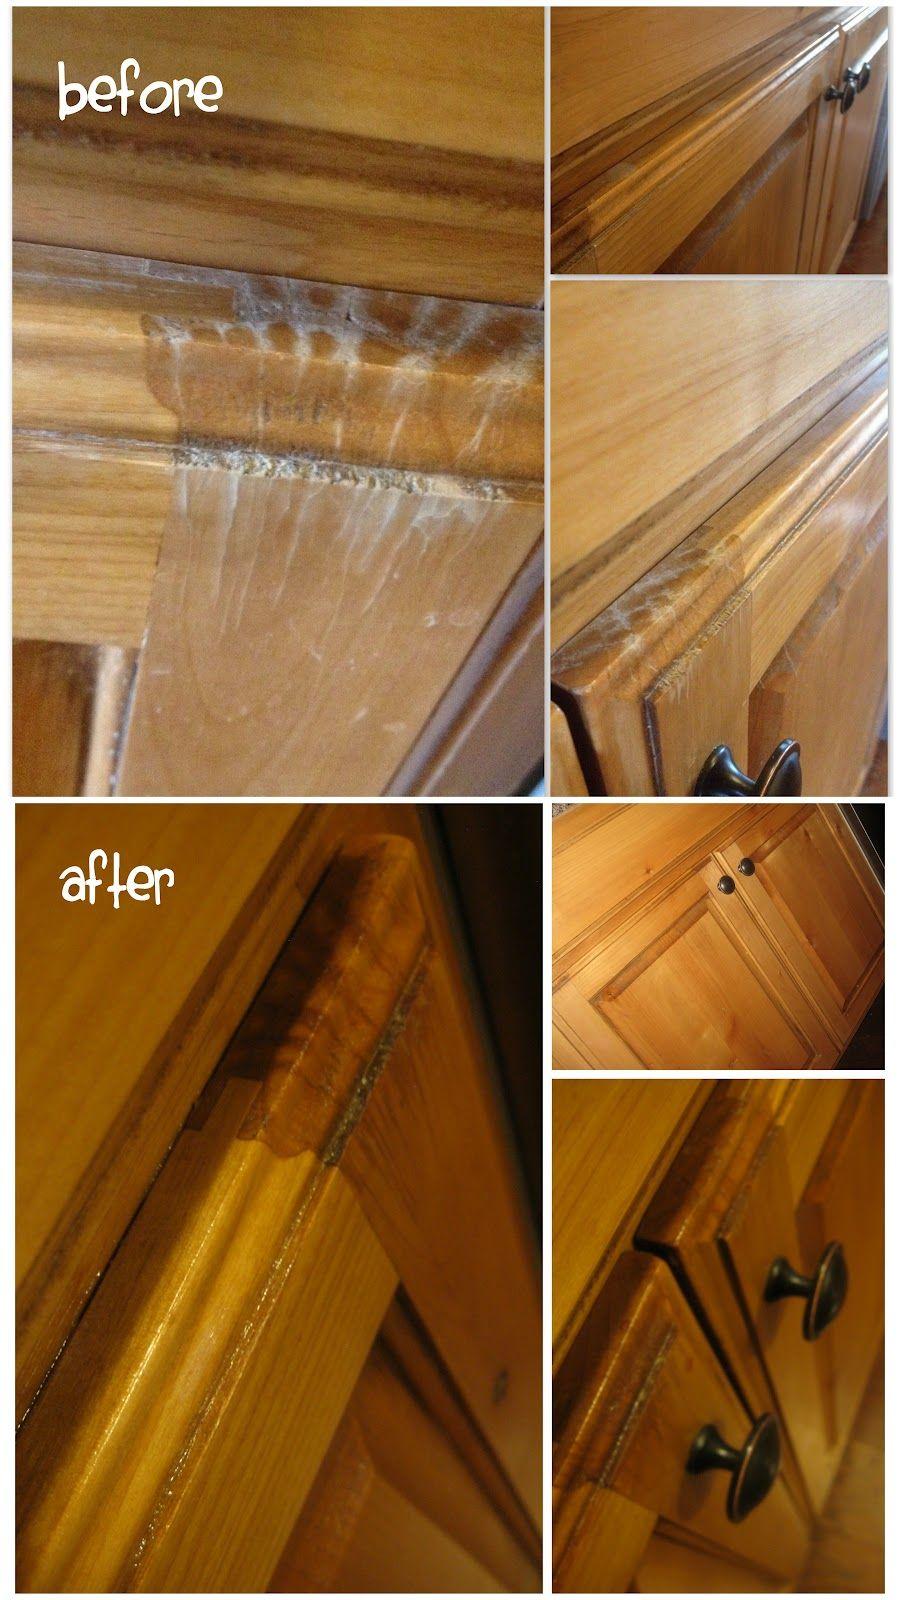 Homemade And Natural Wood Polish Wood Polish Homemade Cleaning